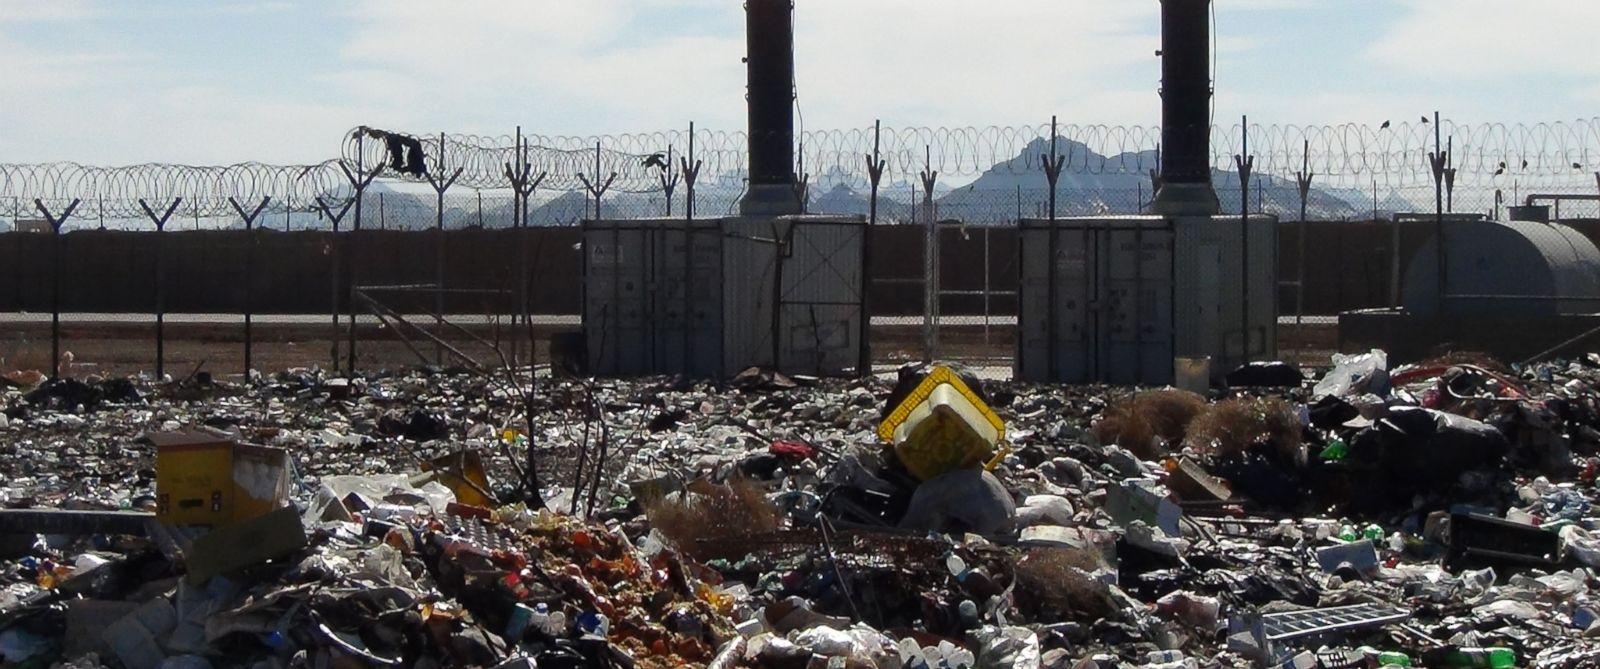 PHOTO: An unused waste incinerator in Shindand in Herat, Afghanistan.